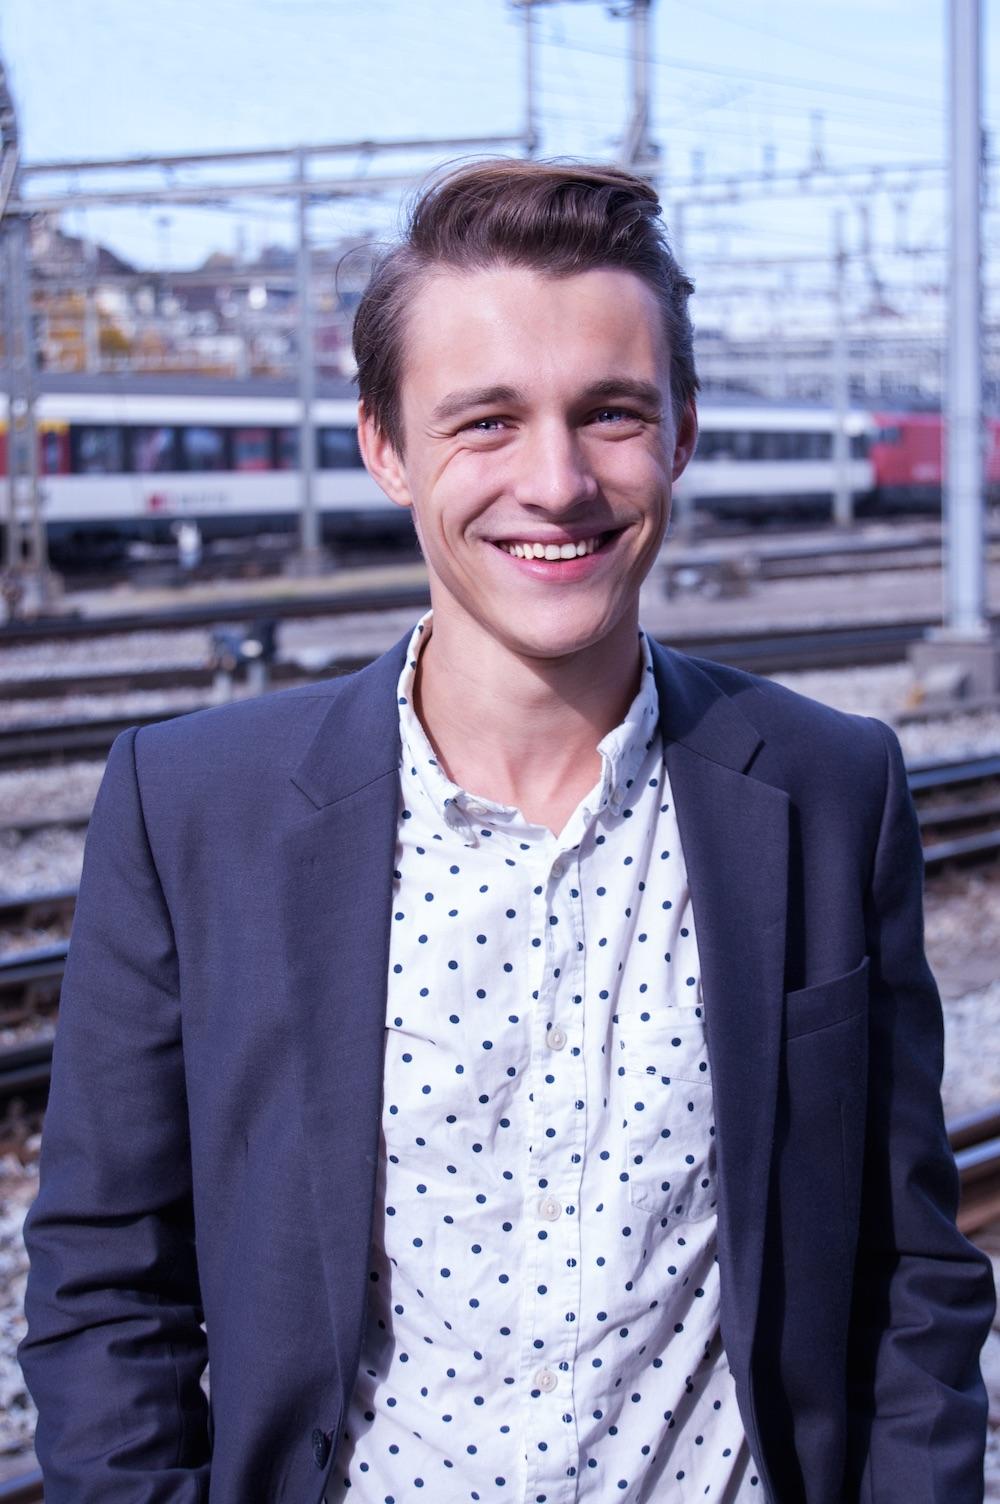 Yannick Gauch, Juso-Stadtratskandidat